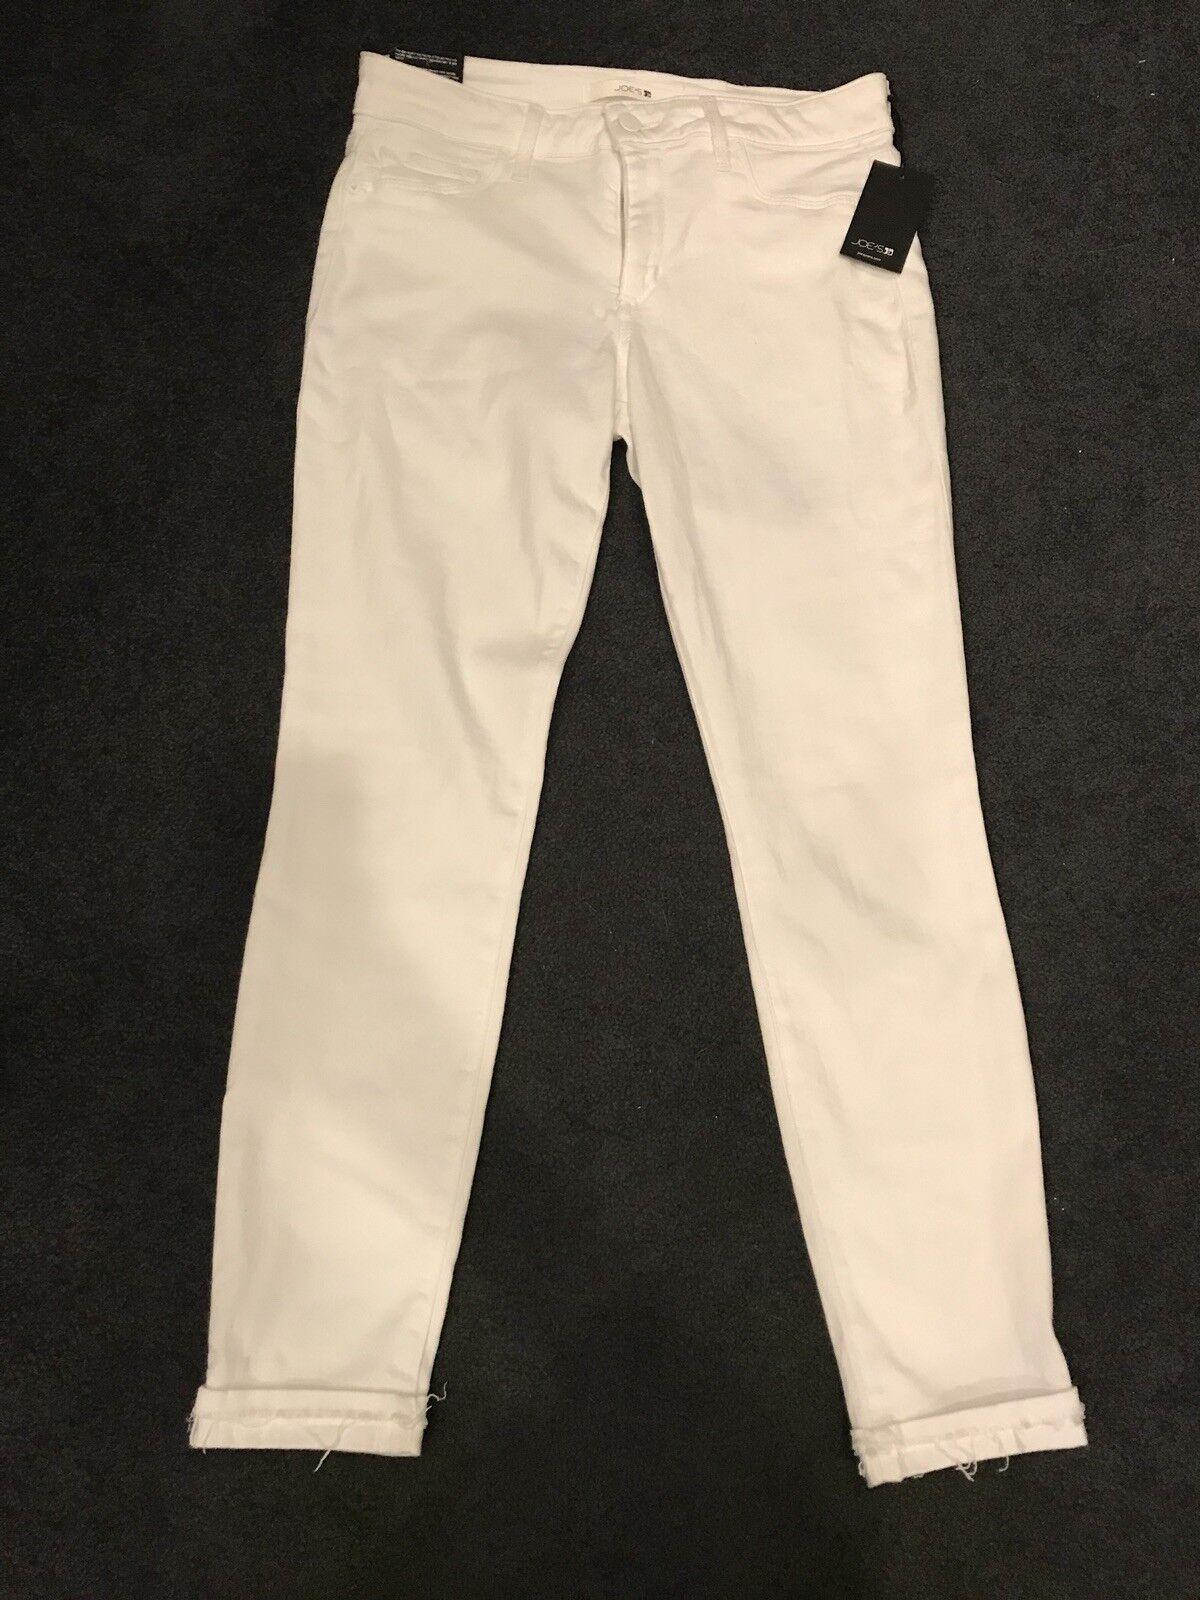 Joe's Jeans NWT Flawless Skinny Crop White Sz 27